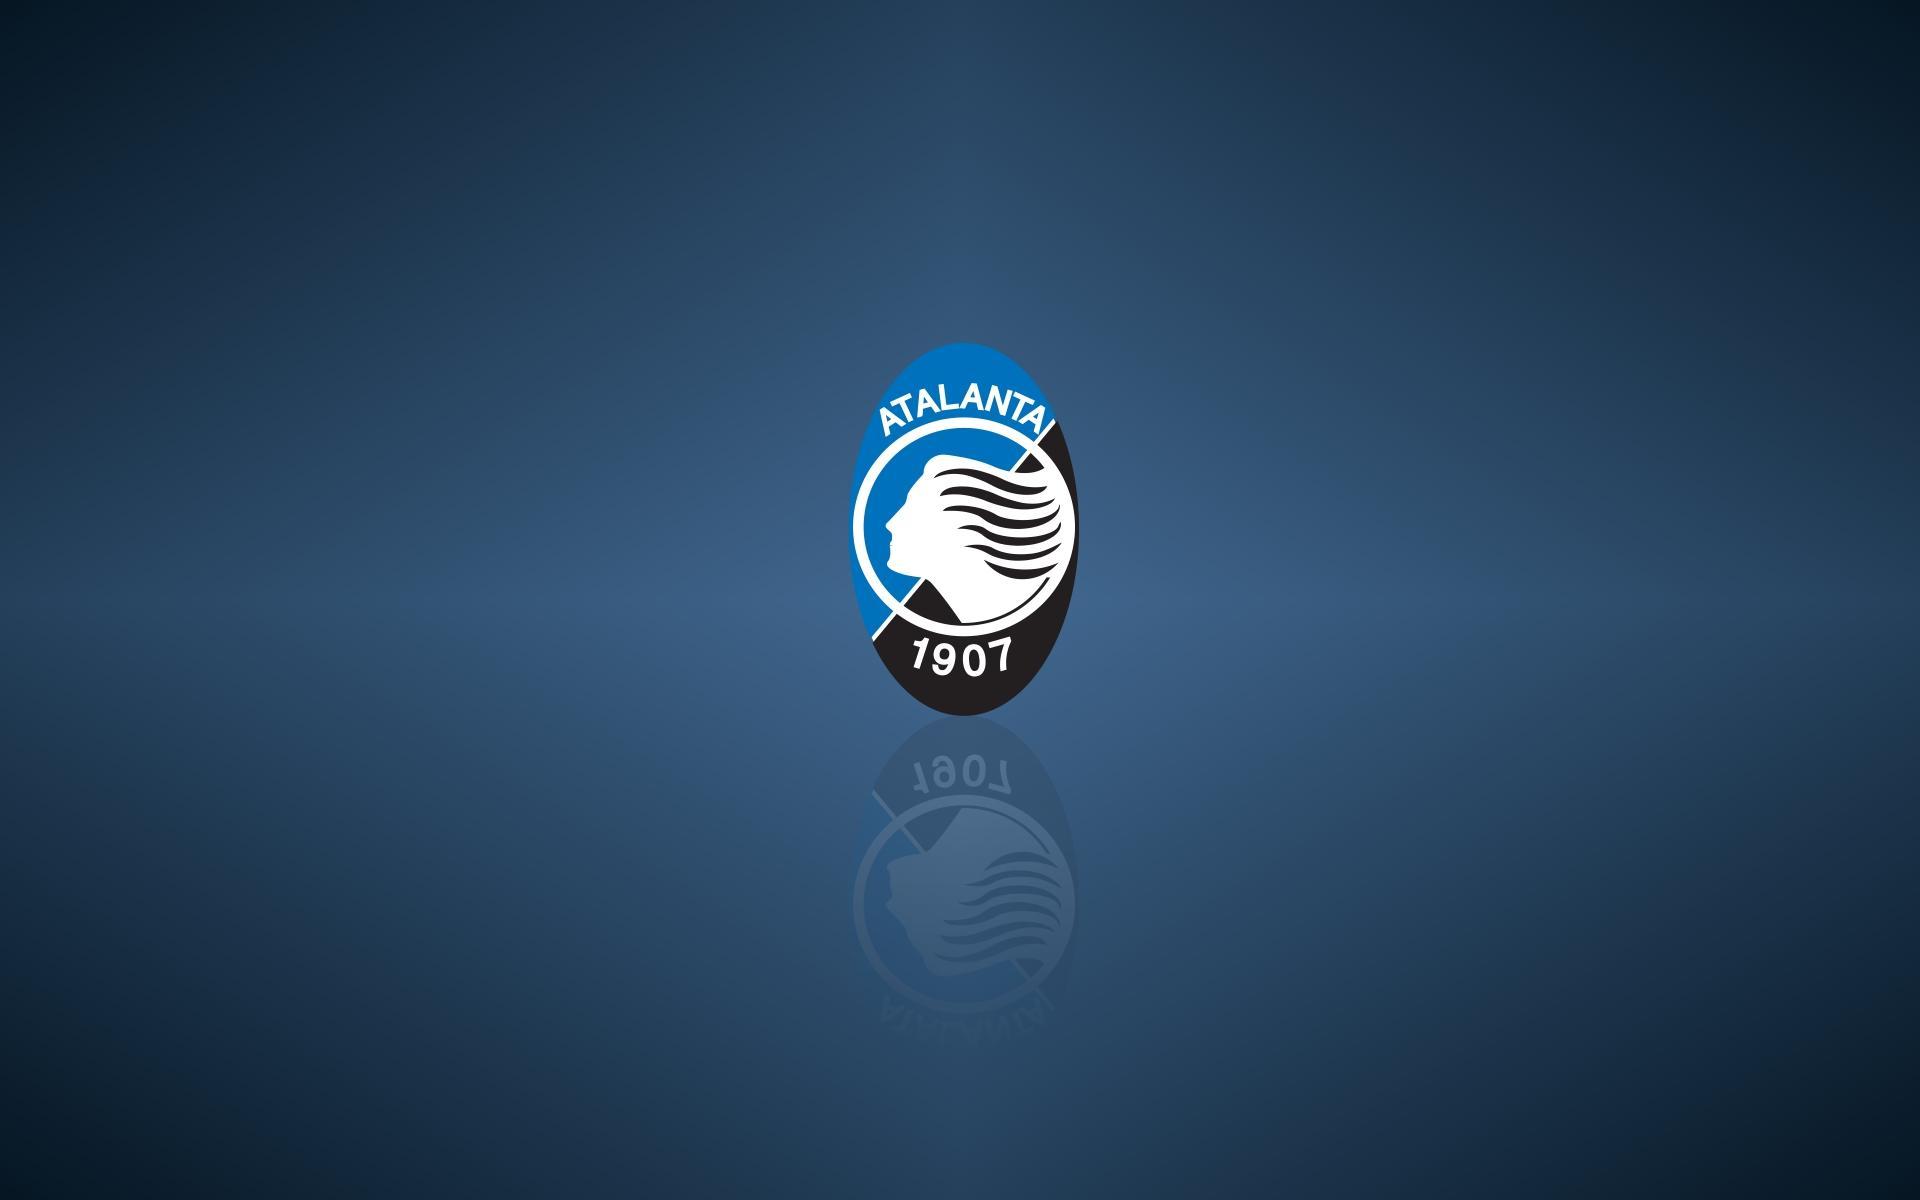 Atalanta B.C. Teams Background